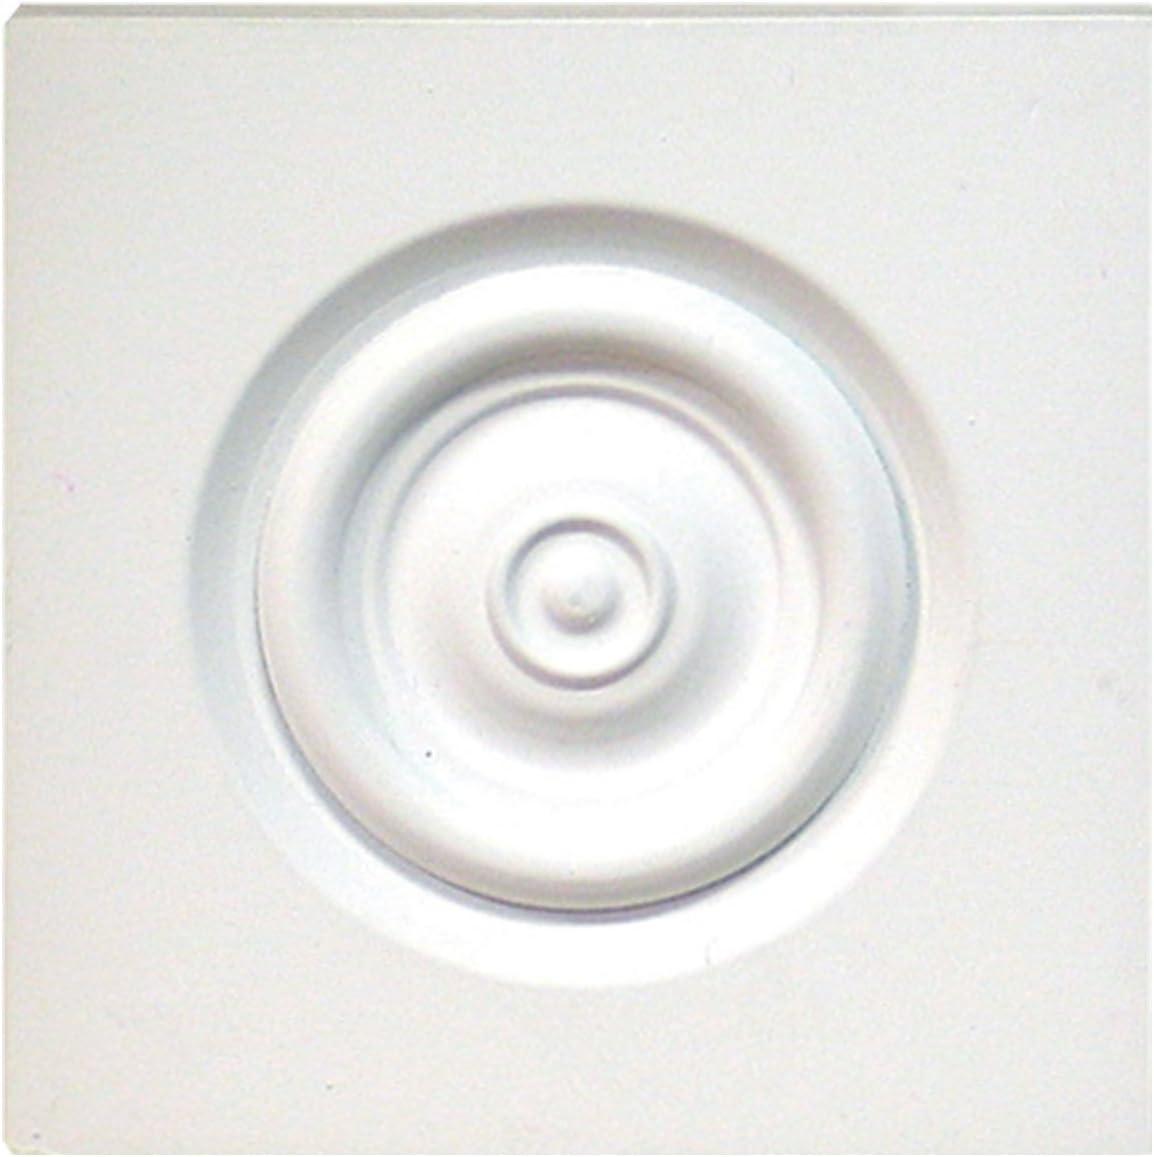 Piece-100 Hard-to-Find Fastener 014973262150 Hex Nut Sleeve Anchors 5//16 x 2-1//2